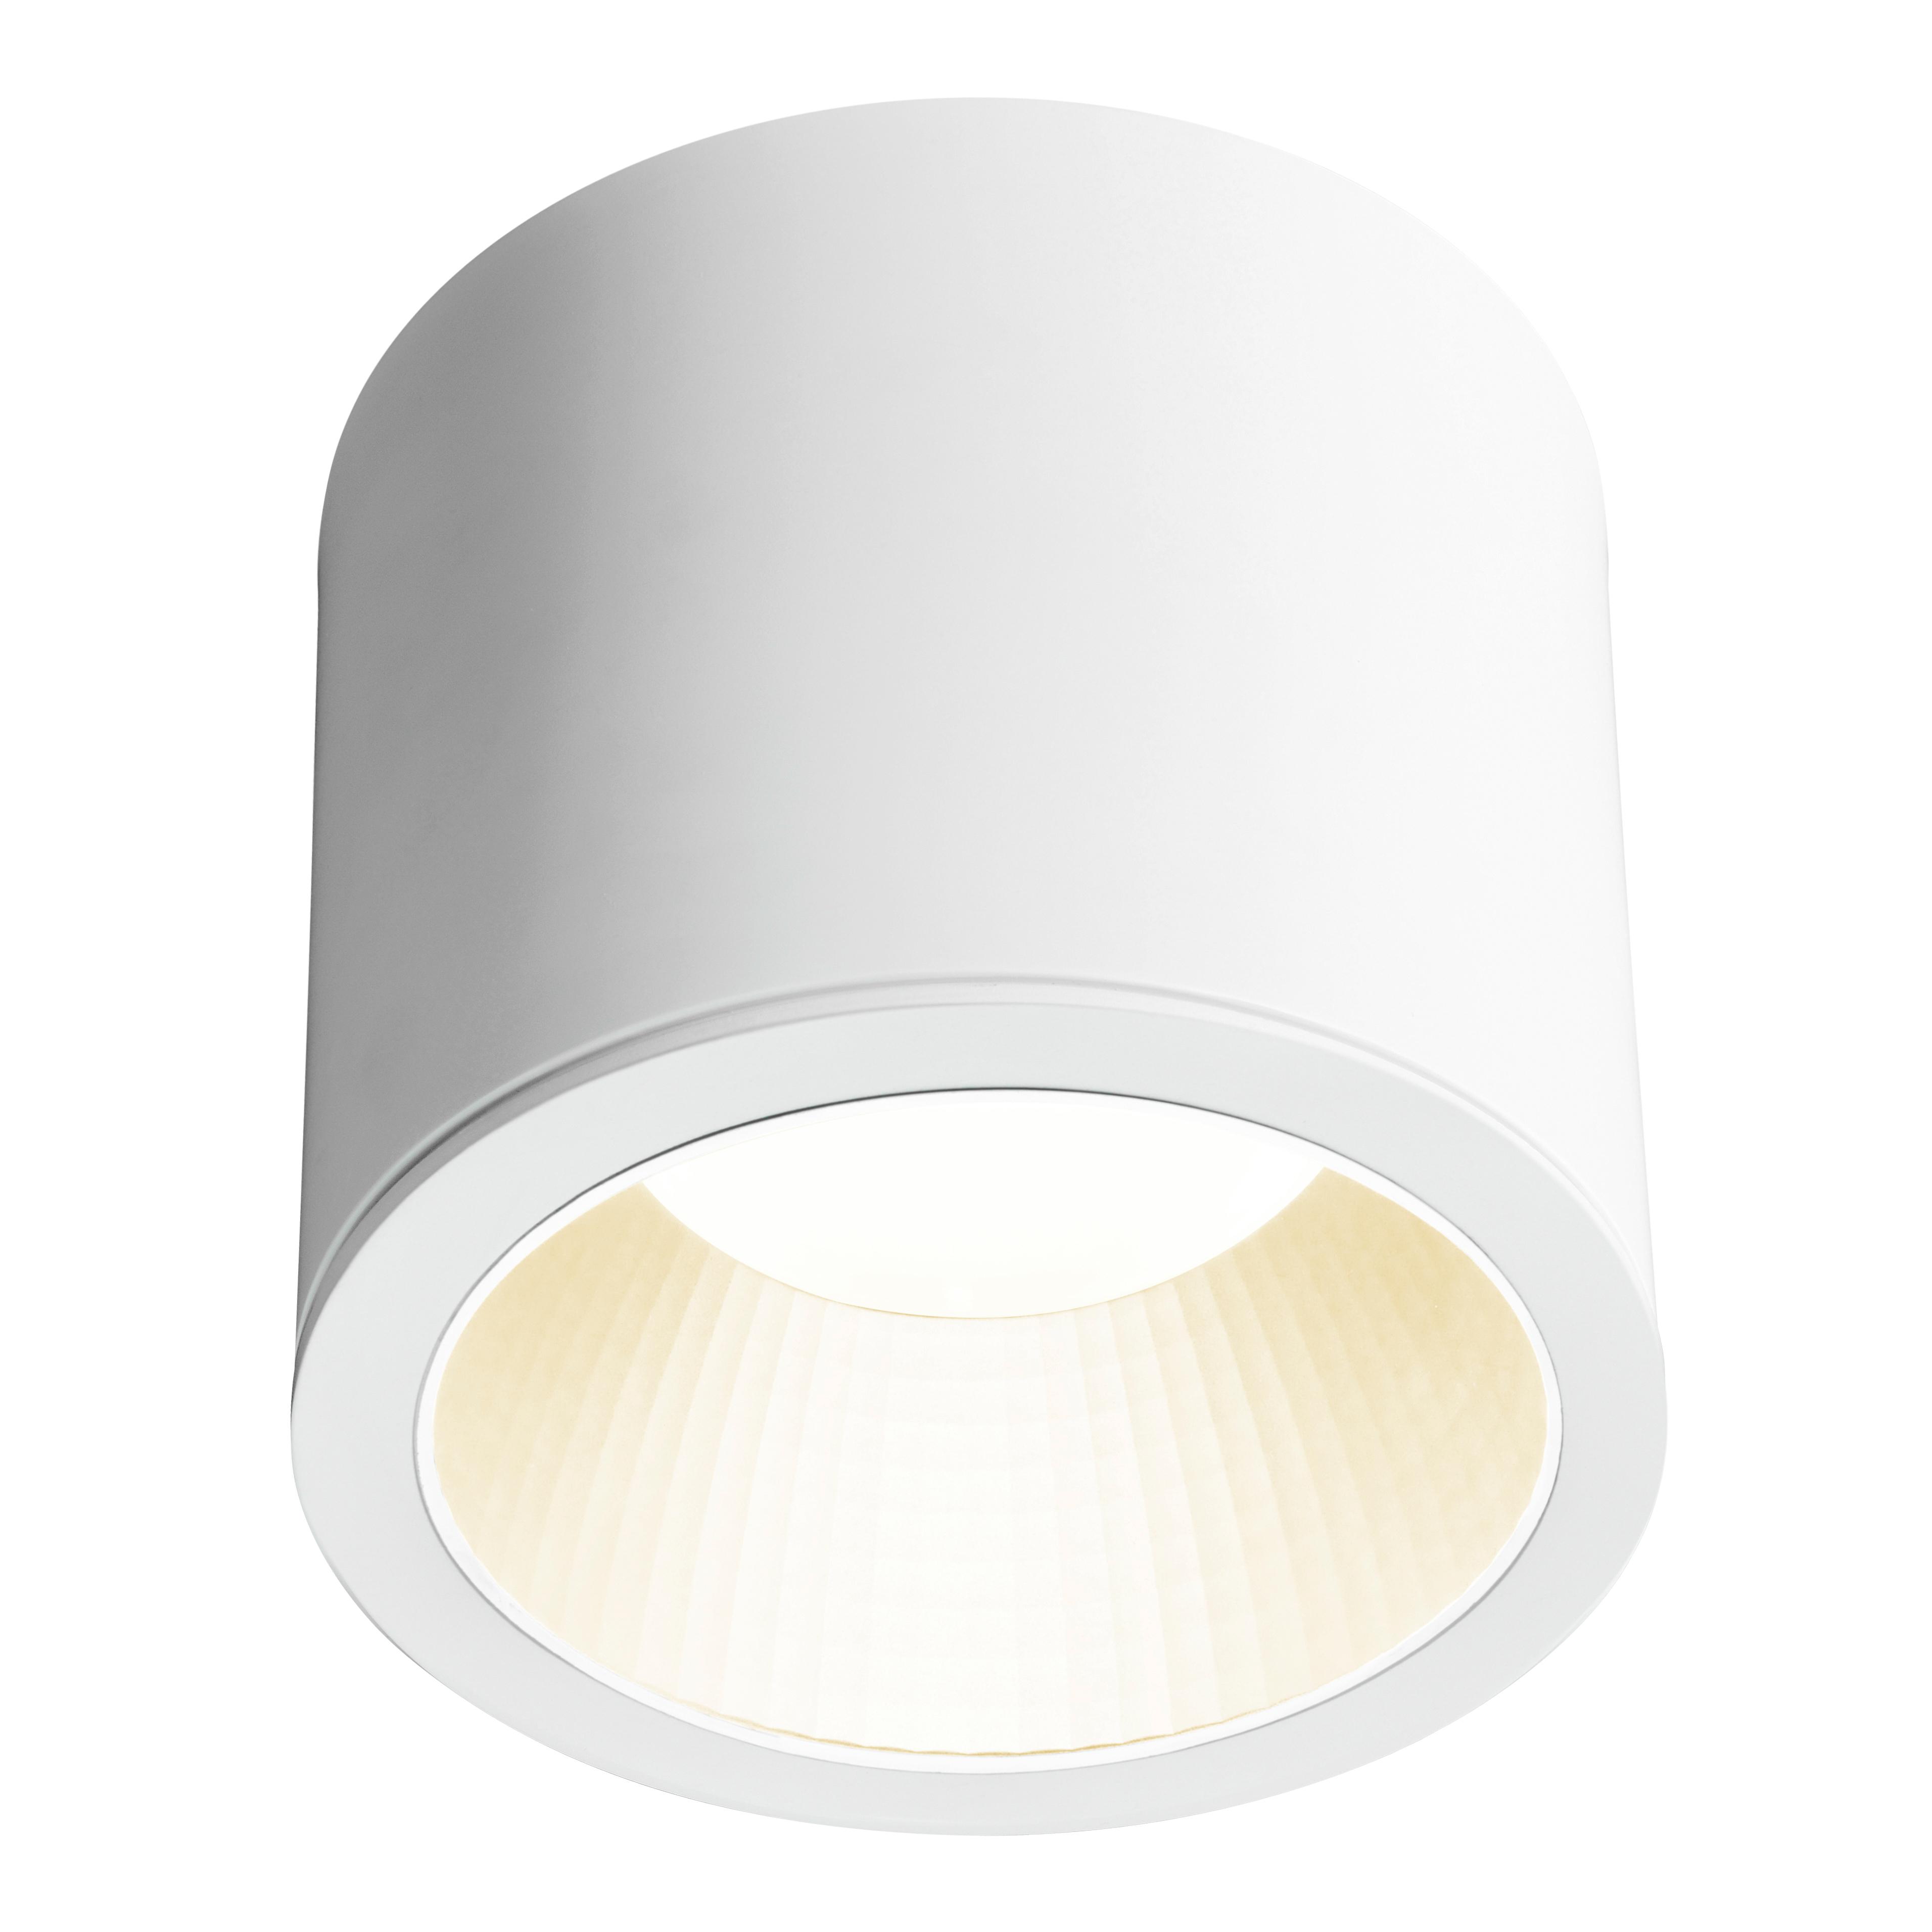 SOLINA 242 LED 44W 4100lm/840 MAT IP20 70° weiß GEN.2